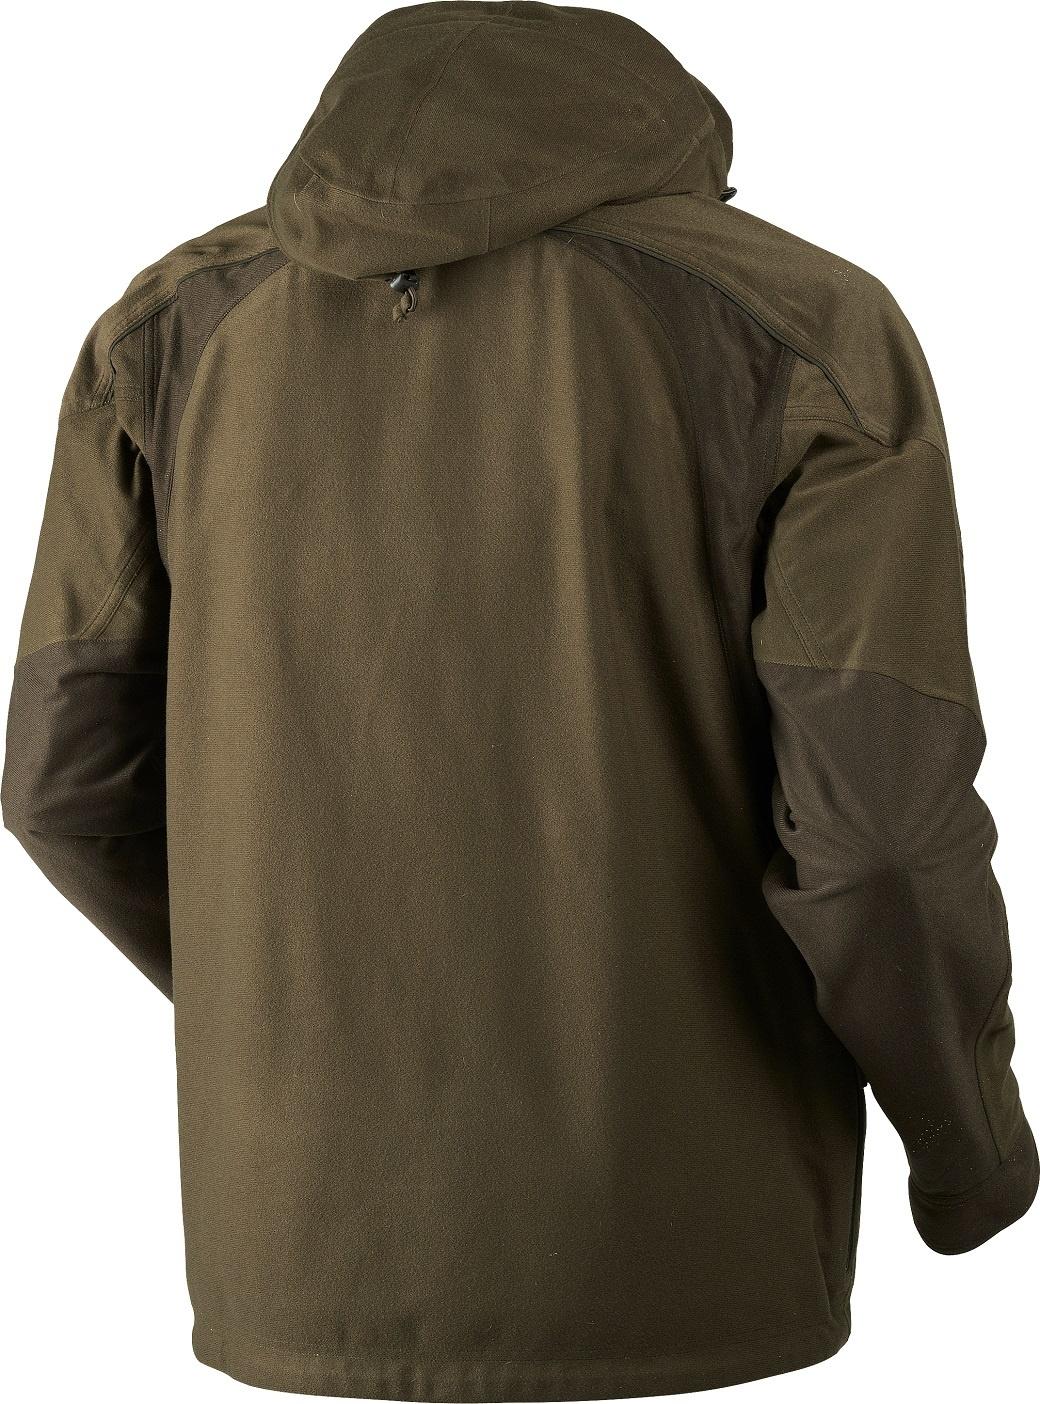 Härkila Norse Jacket Hunting Green Shadow Brown-2